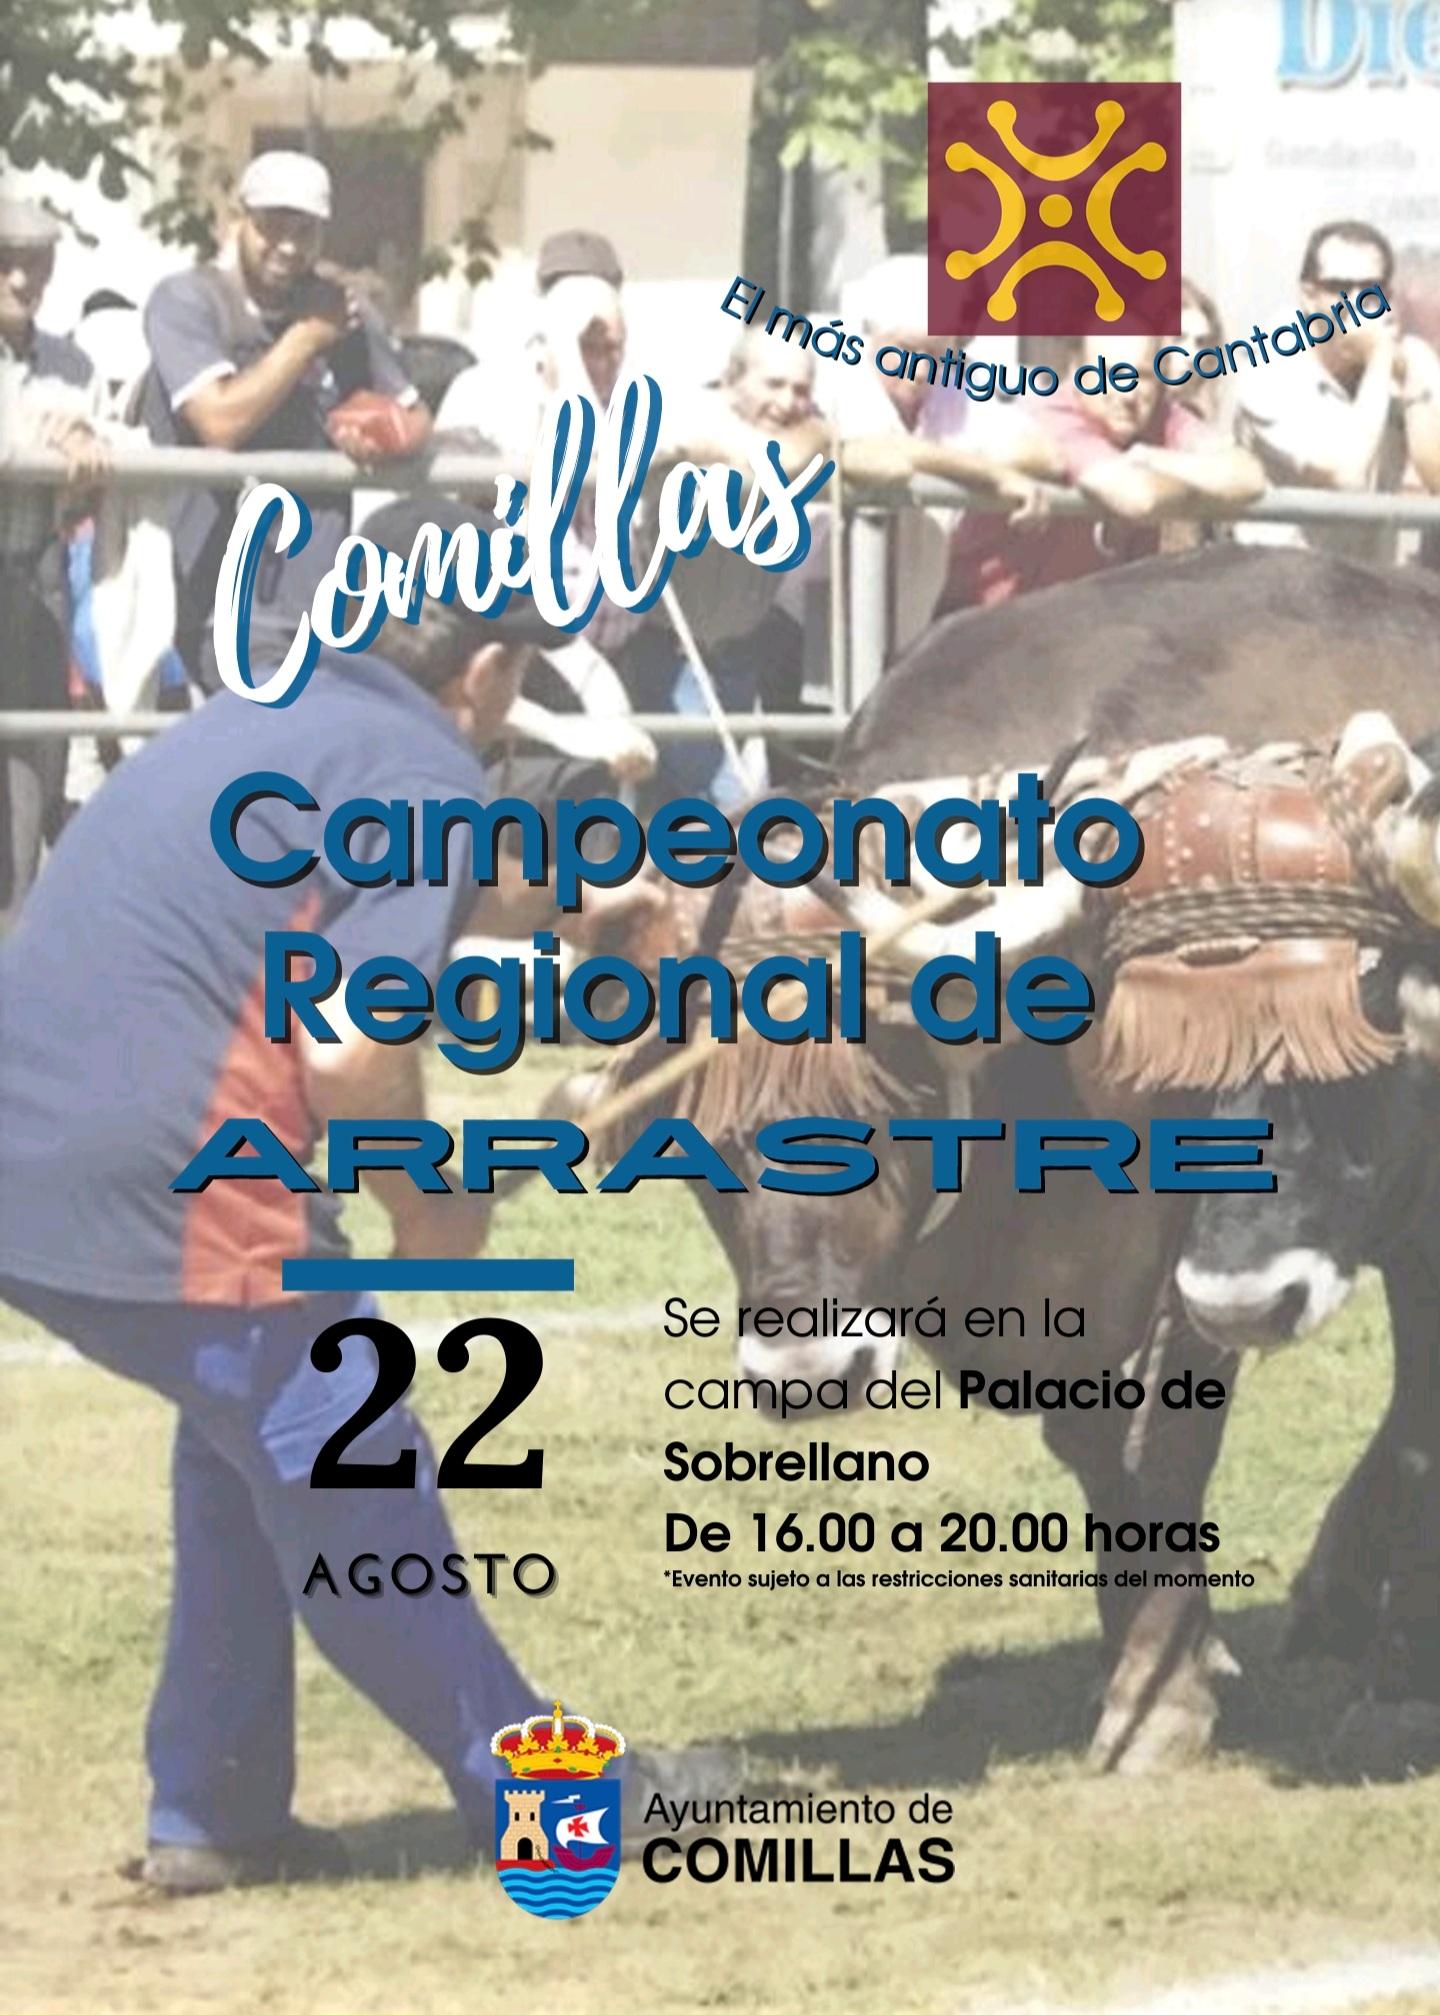 CAMPEONATO REGIONAL DE ARRASTRE